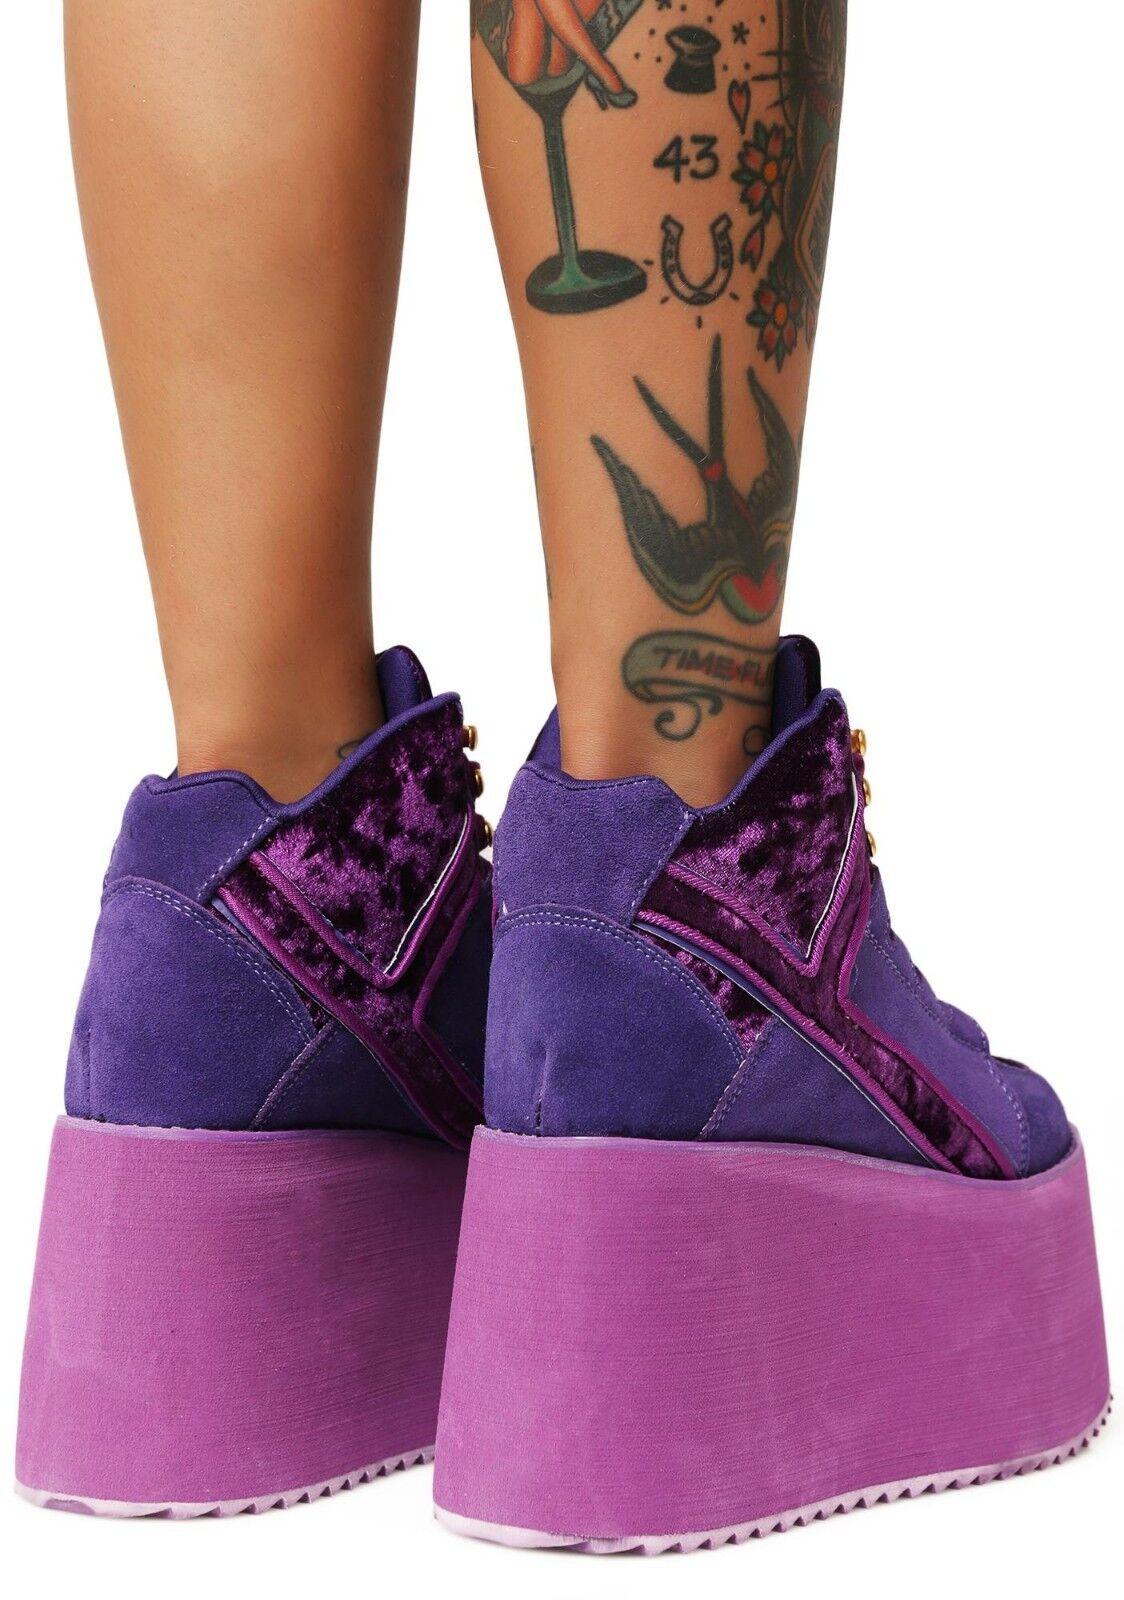 YRU Qozmo High Top 2 púrpura Gótico Velvet Gamuza Rave Gótico púrpura Punk Zapatos Zapatillas De Plataformas 4b99ba